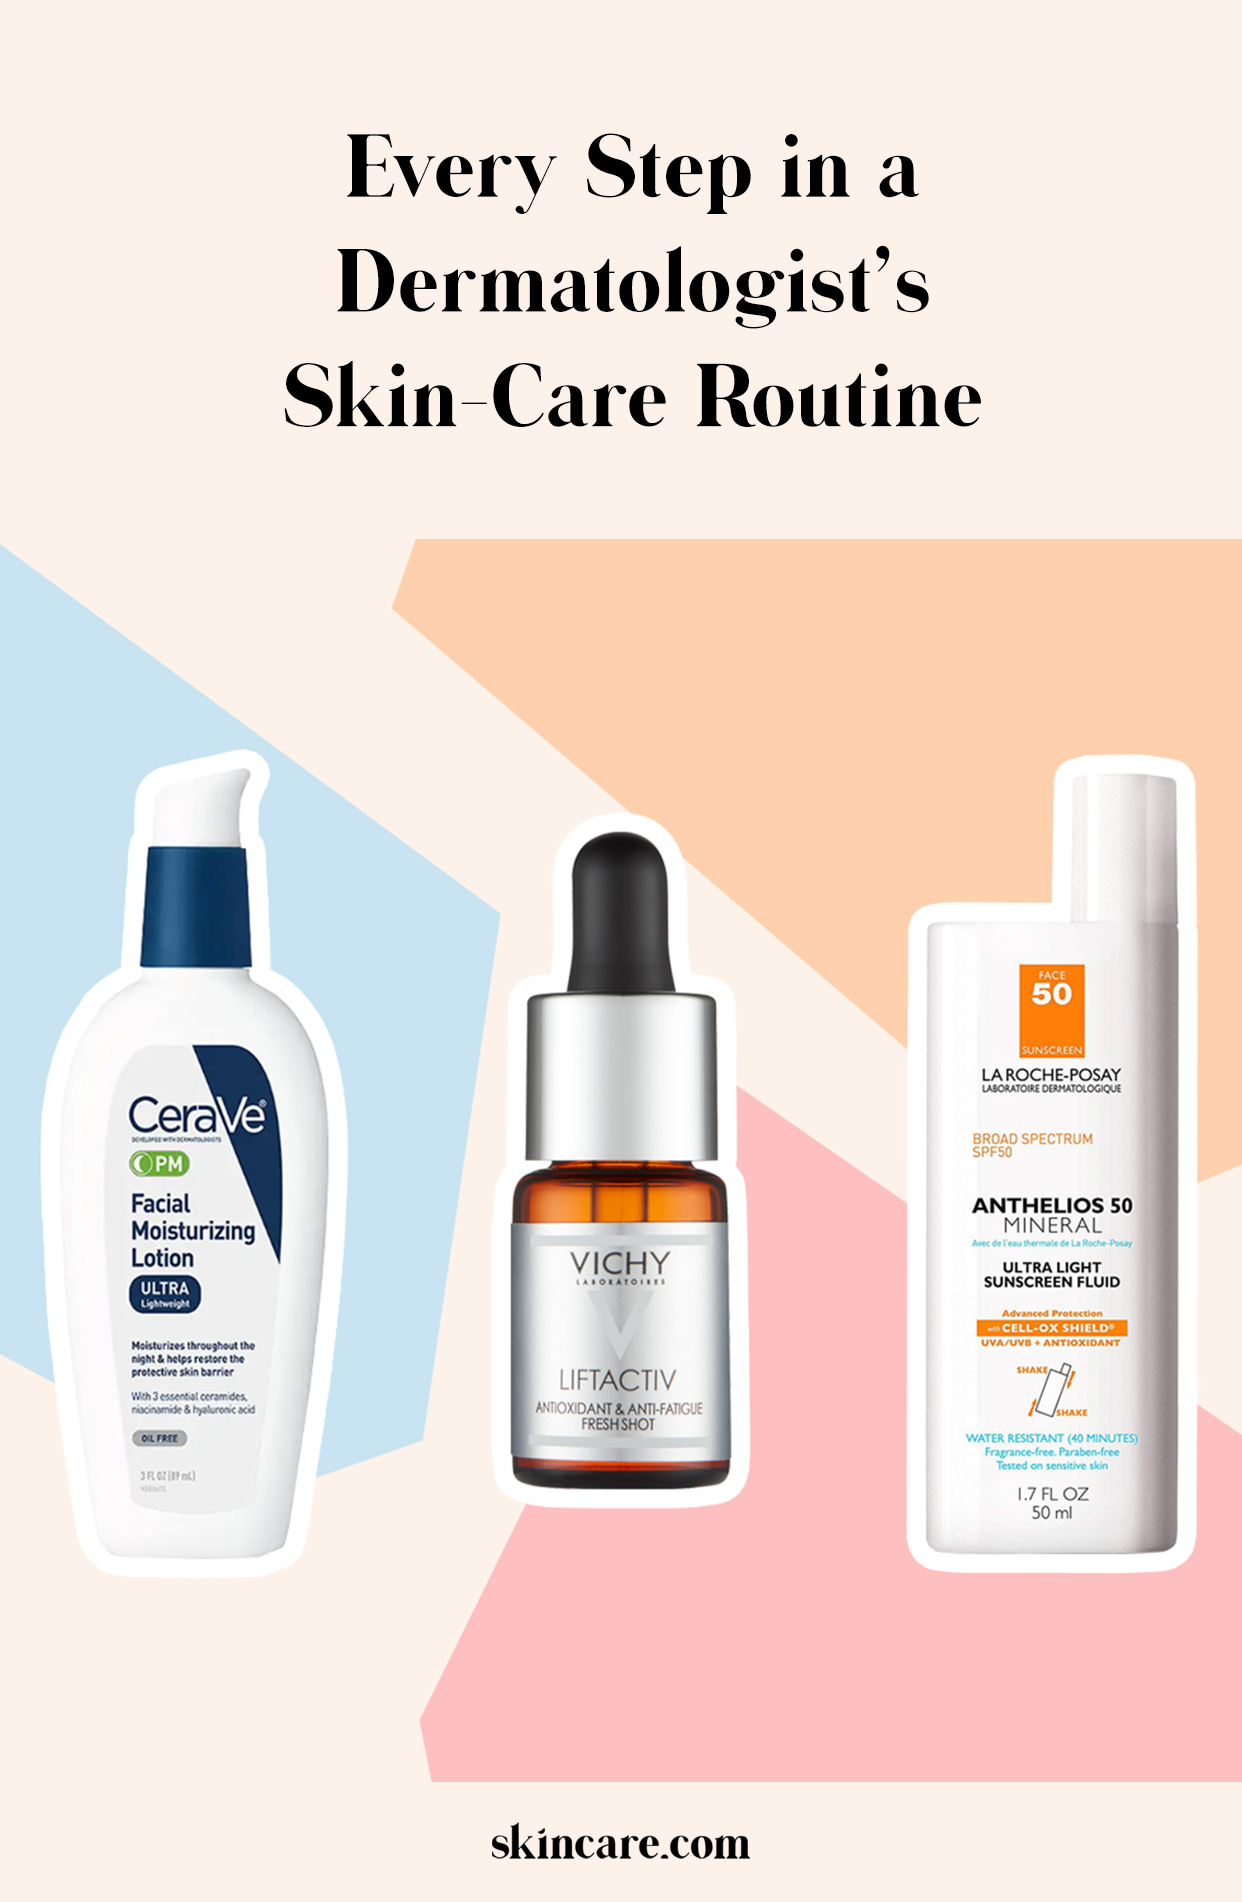 Dermatologist Morning Skin Care Routine Skincare Com By L Oreal Dermatologist Skin Care Routine Morning Skin Care Routine Skin Care Routine